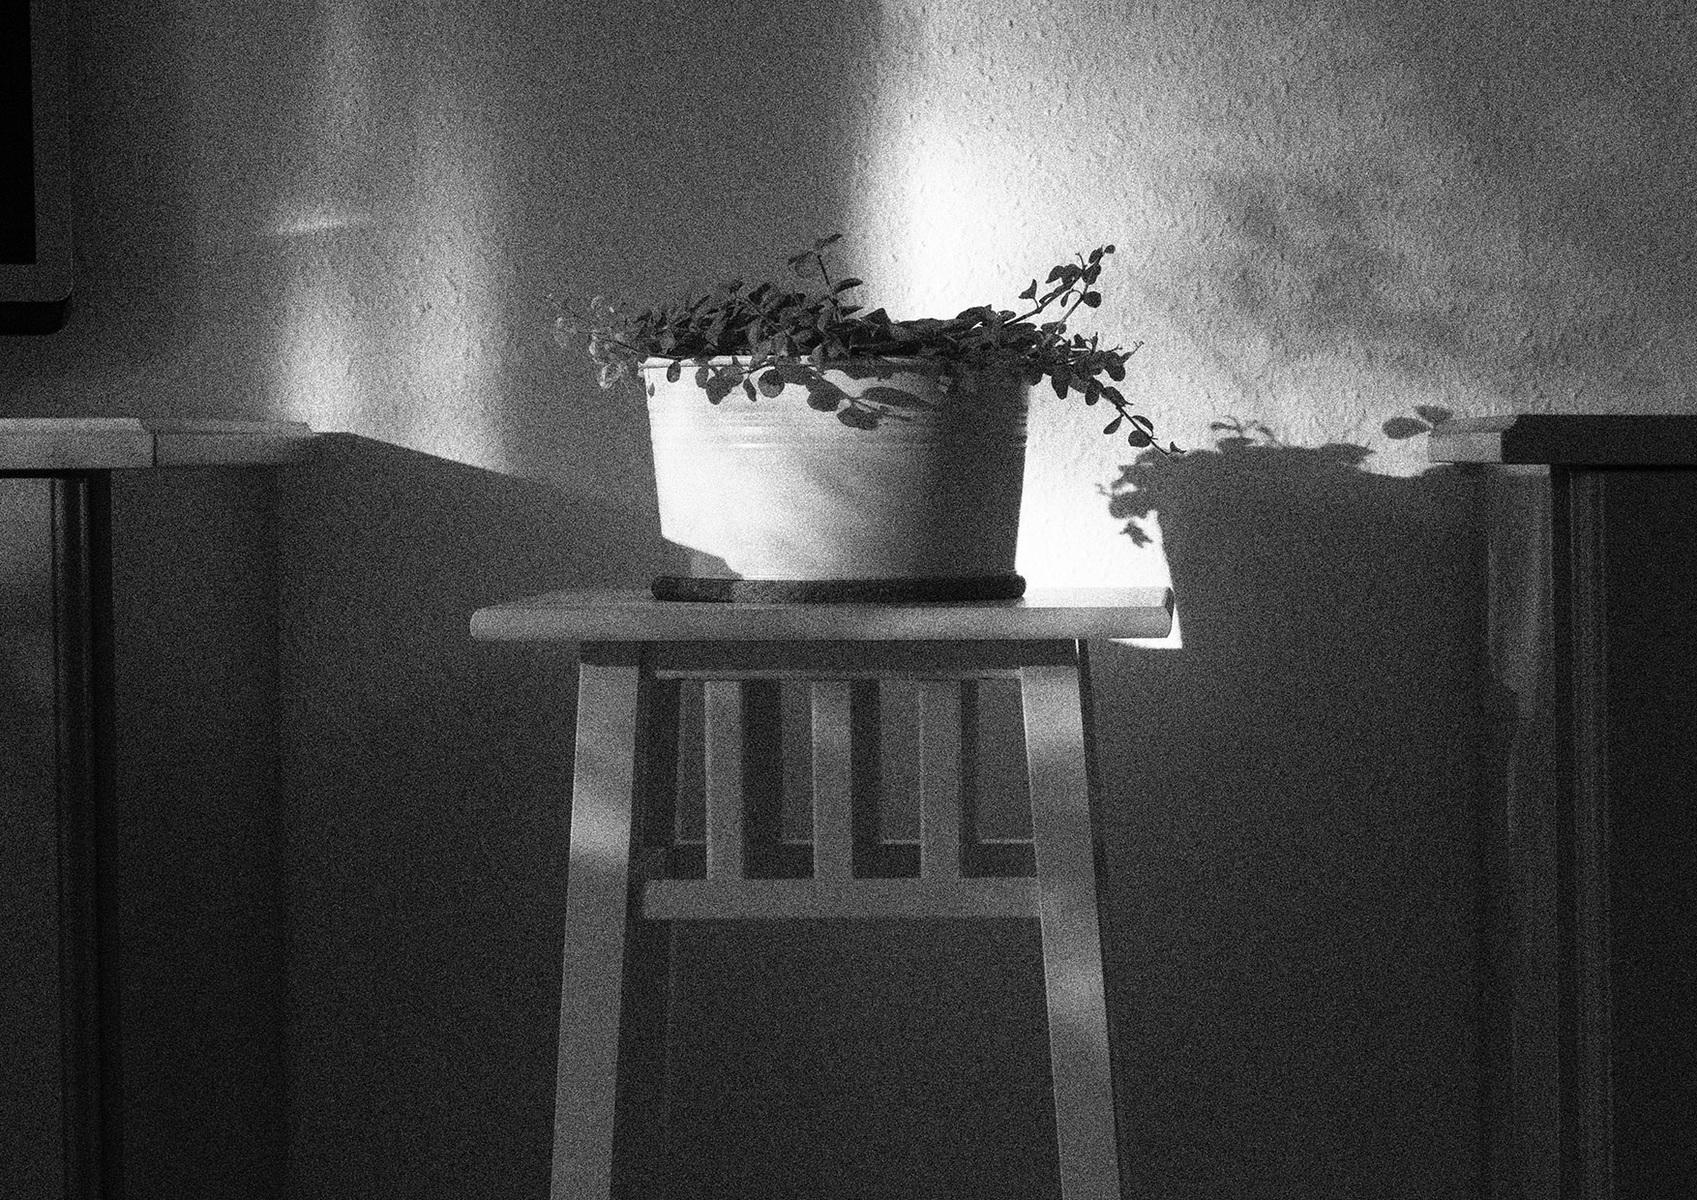 protasiuk - The Narrow Daylight 3